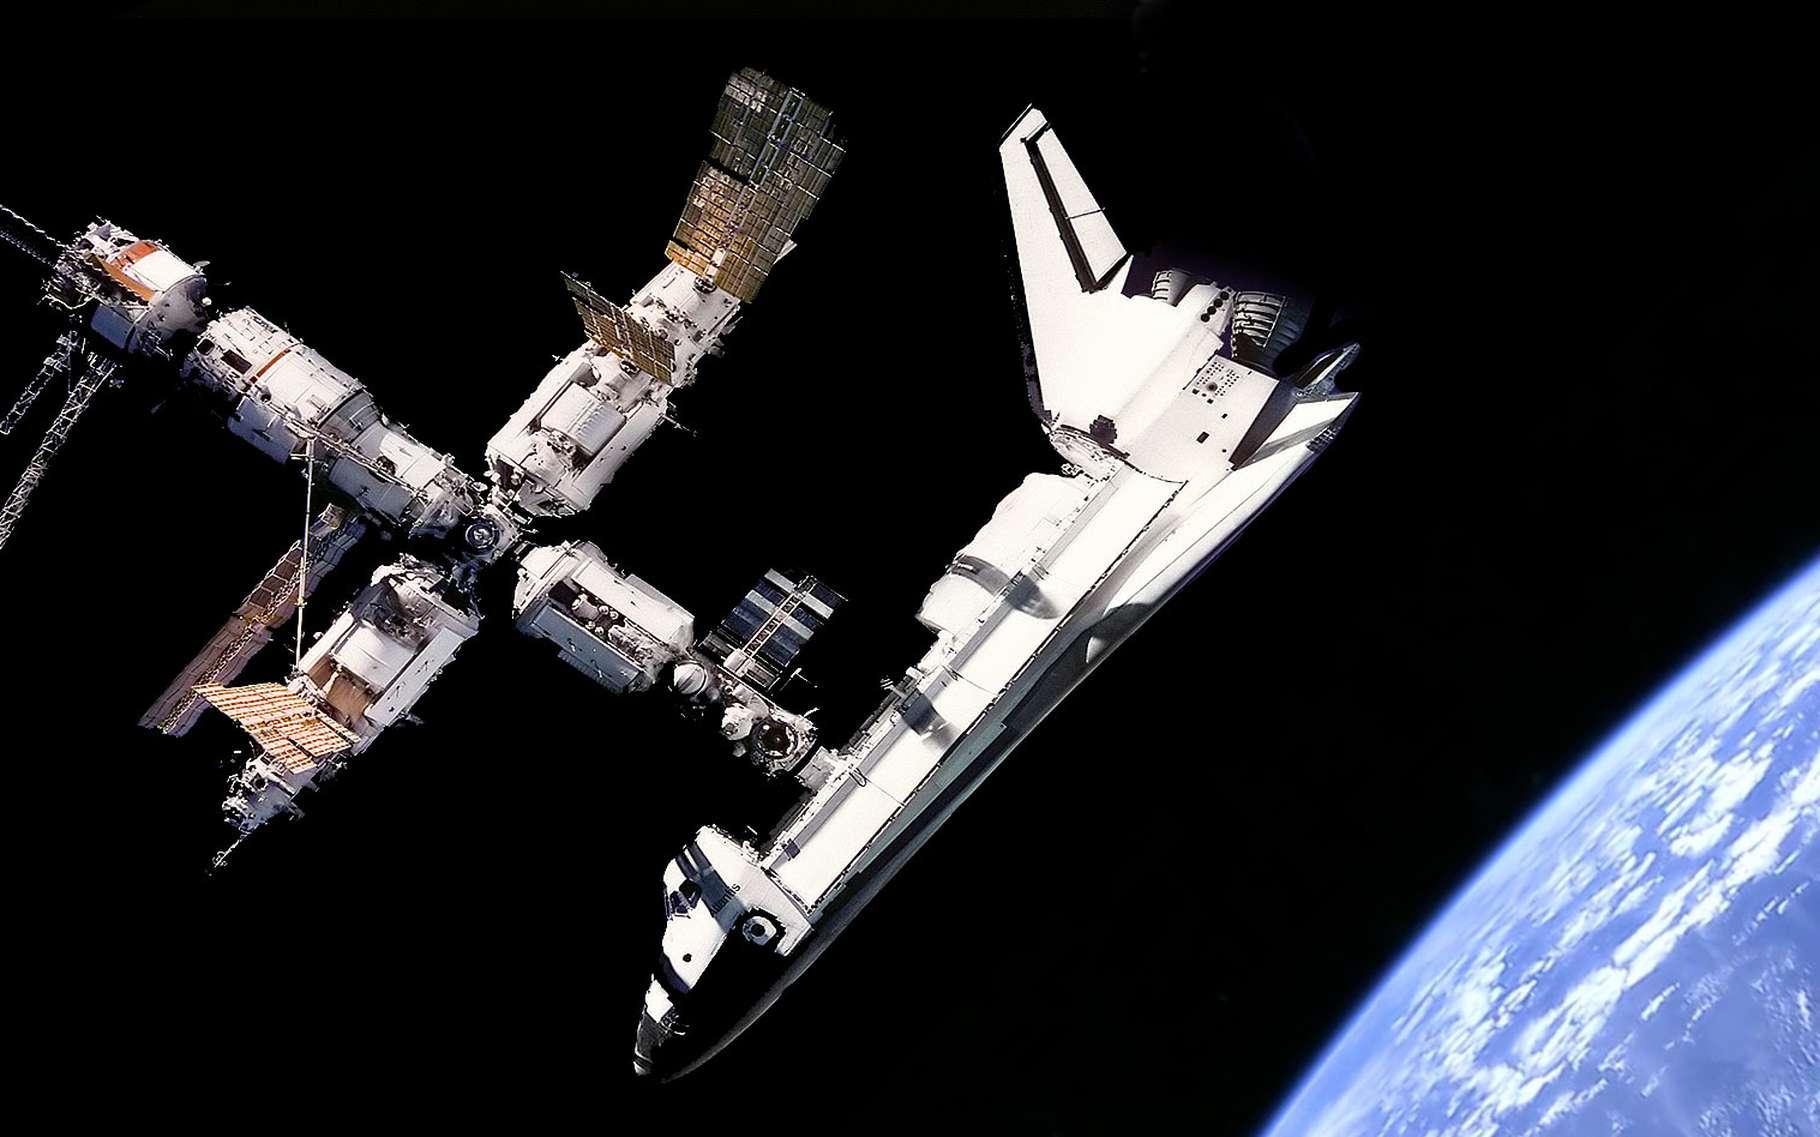 پهلوگیریِ شاتل فضایی آتلانتیس به ایستگاه فضایی میر